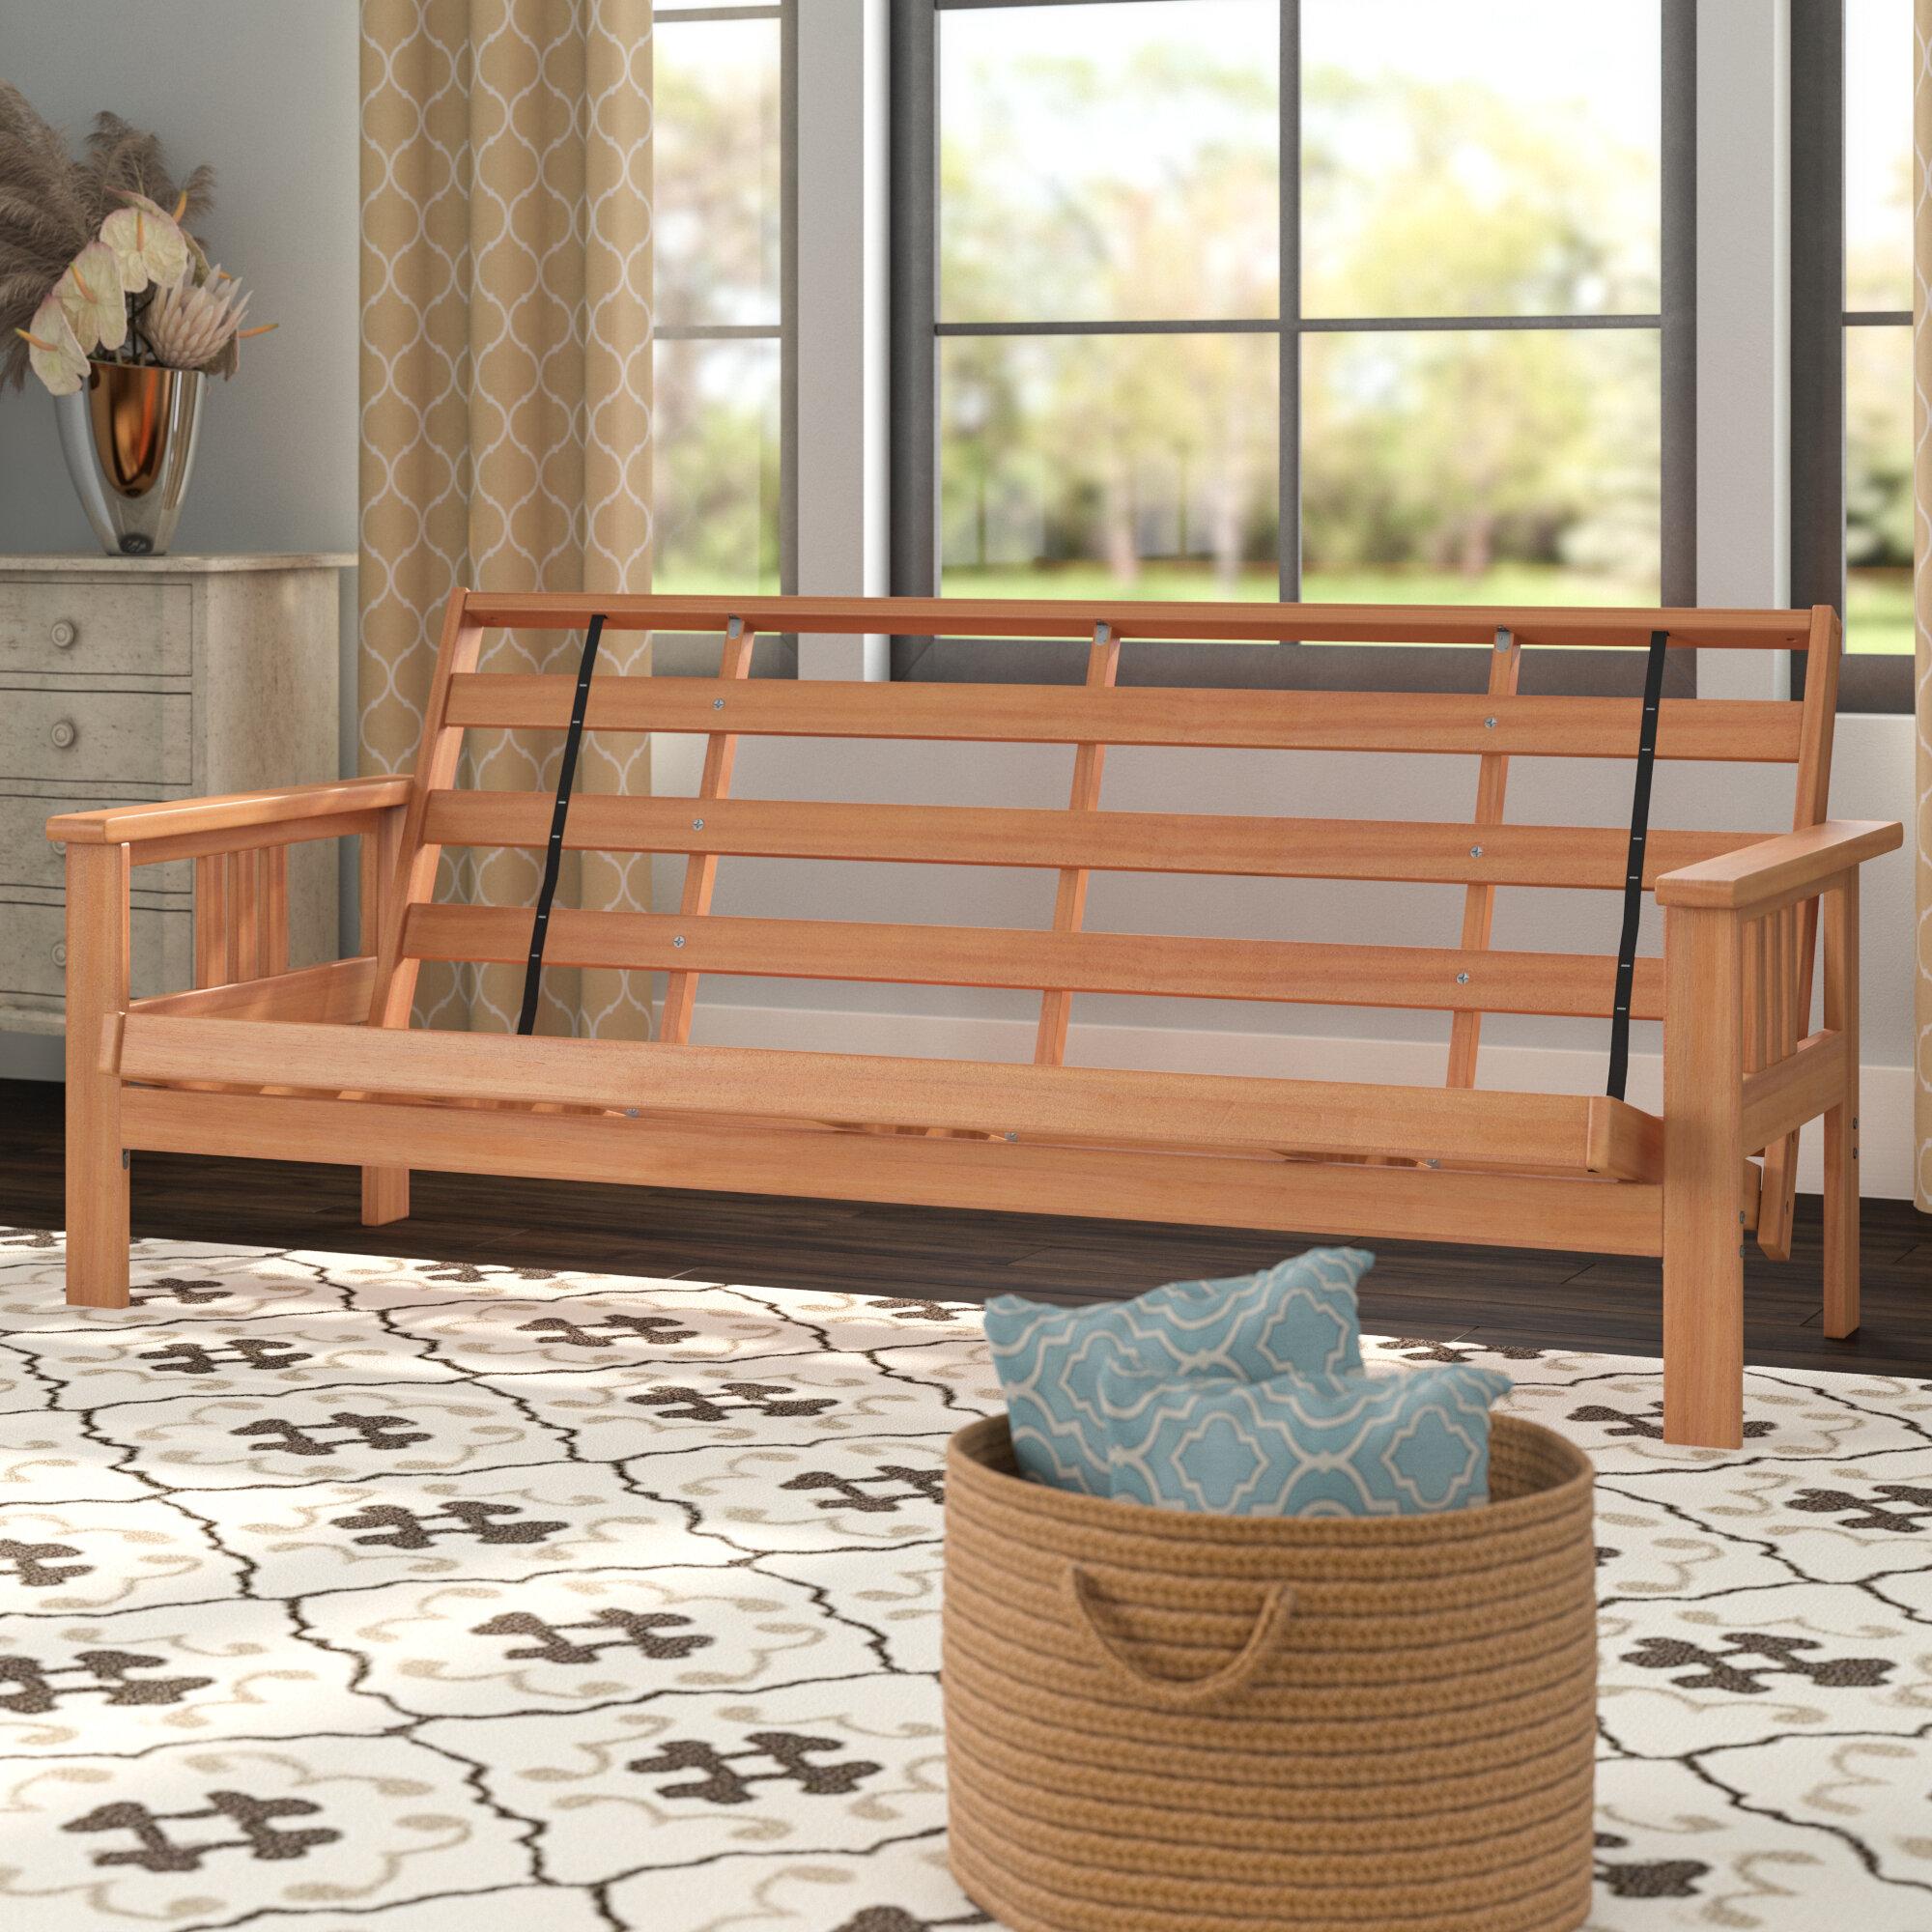 sale mall futon p frames mattress if for futons wood all